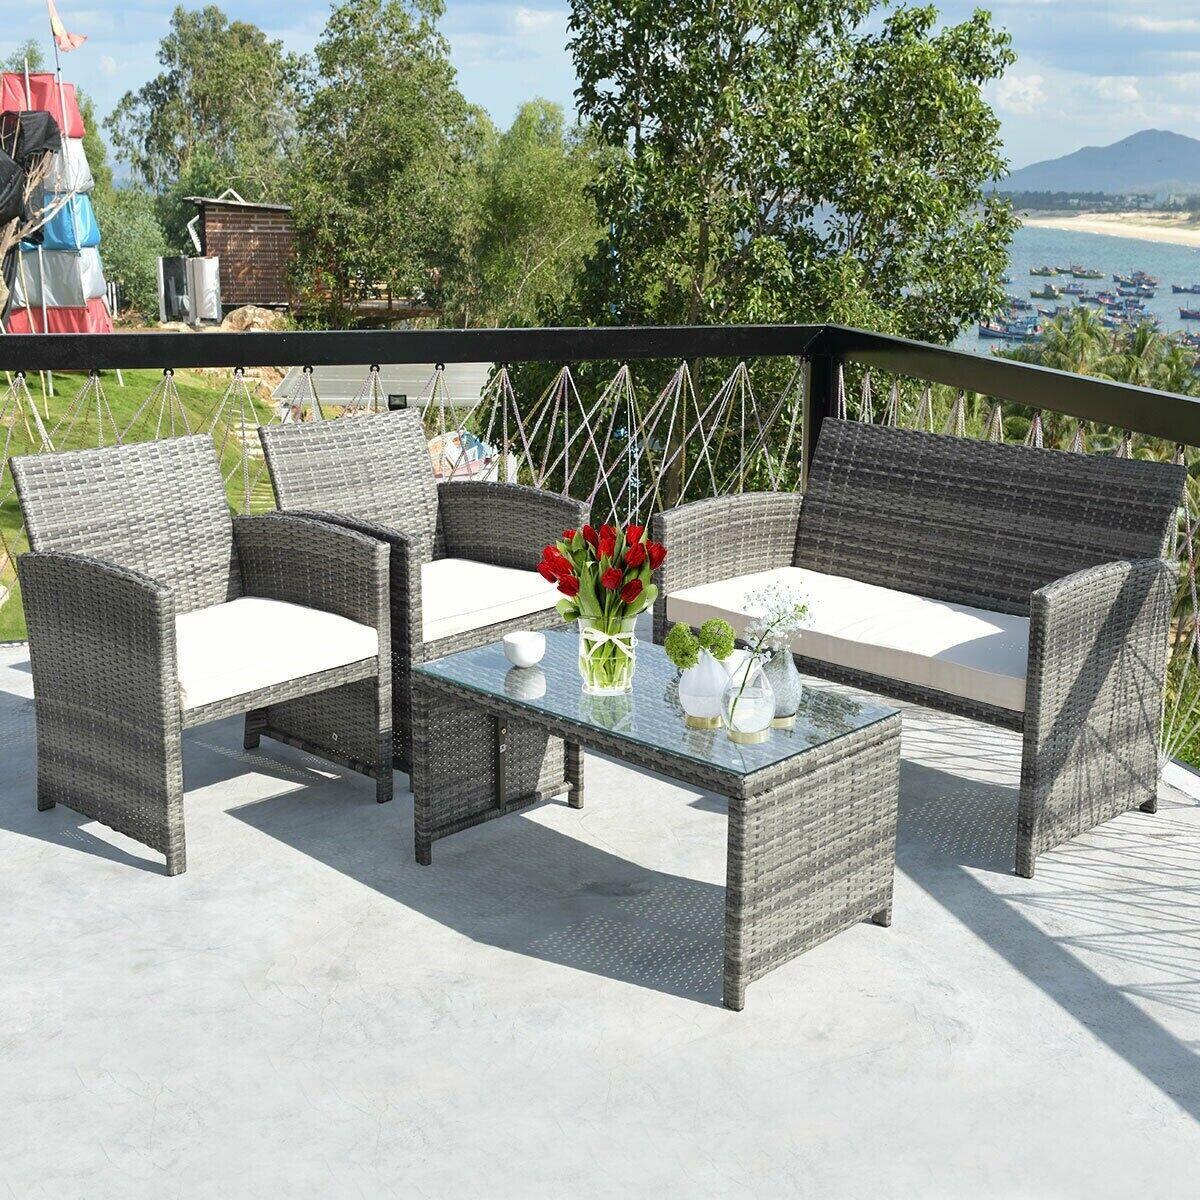 Garden Furniture - 4 Piece Rattan Outdoor Patio Furniture Garden Set Sofa W/ Cushions - Glass Table